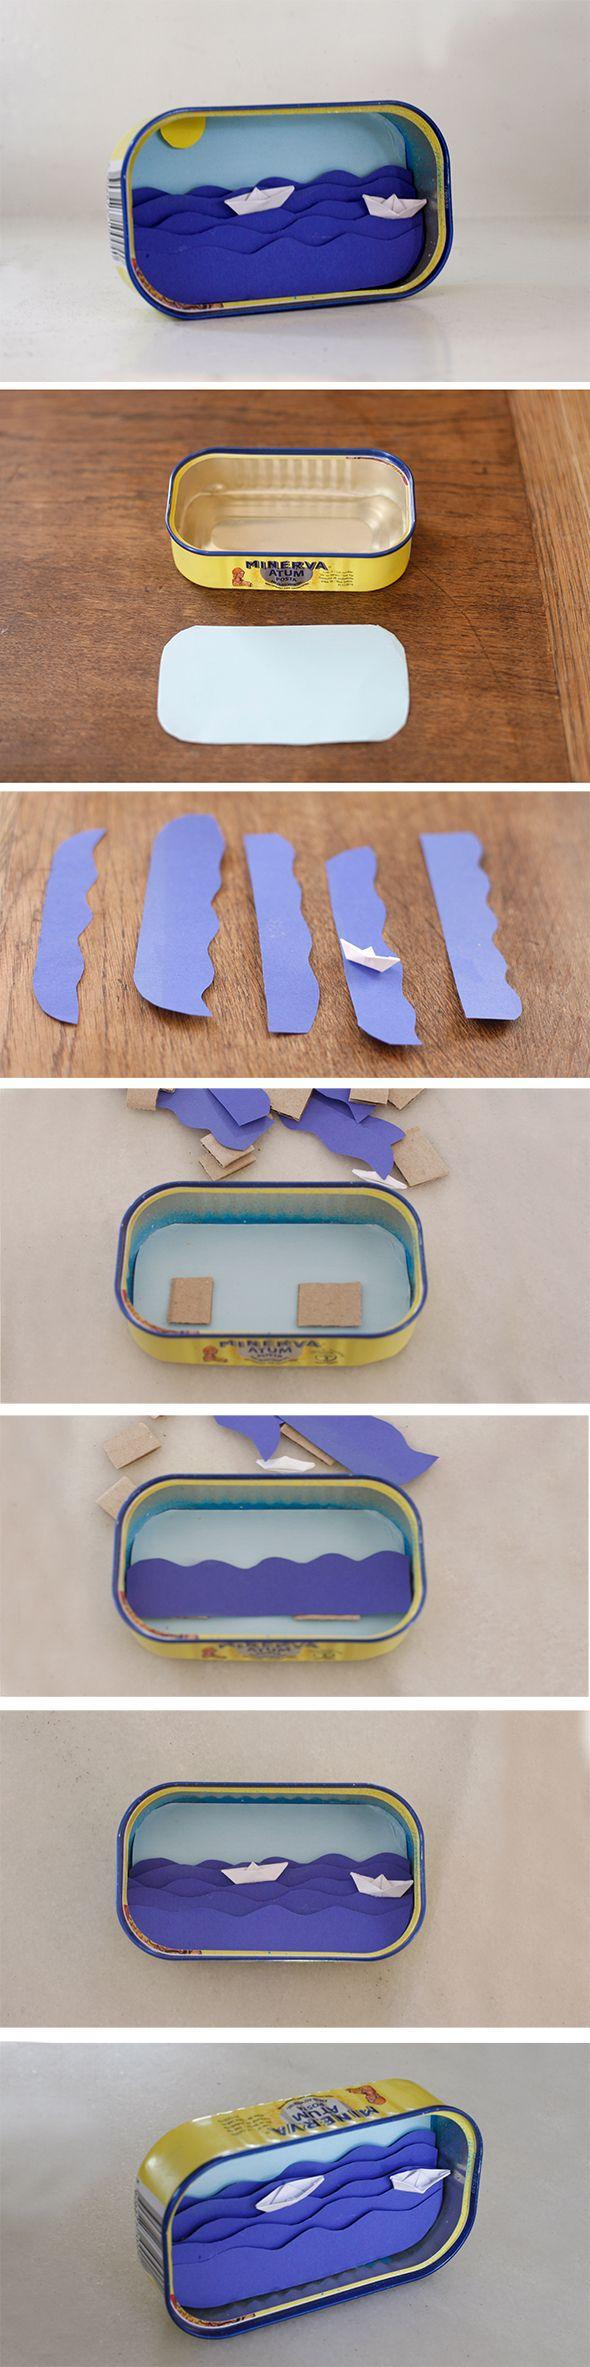 sardinendose recycling lata reciclar manualidad sardine see ocean mar can craft basteln geschenk regalo present kids kinder ninos